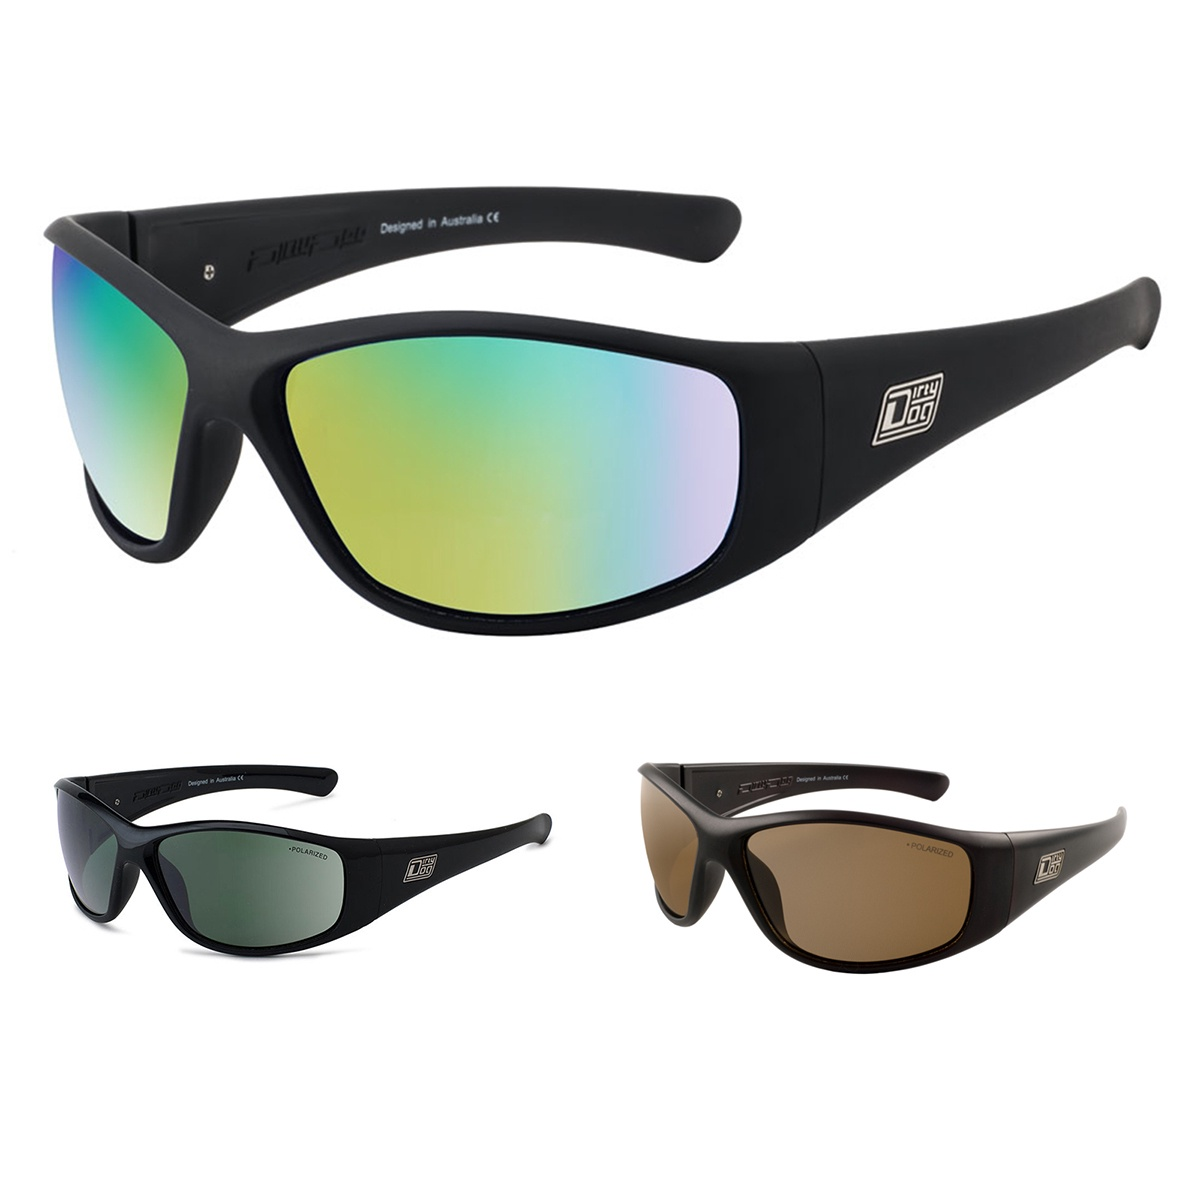 057550df137 Dirty Dog Ridge Polarised Sunglasses